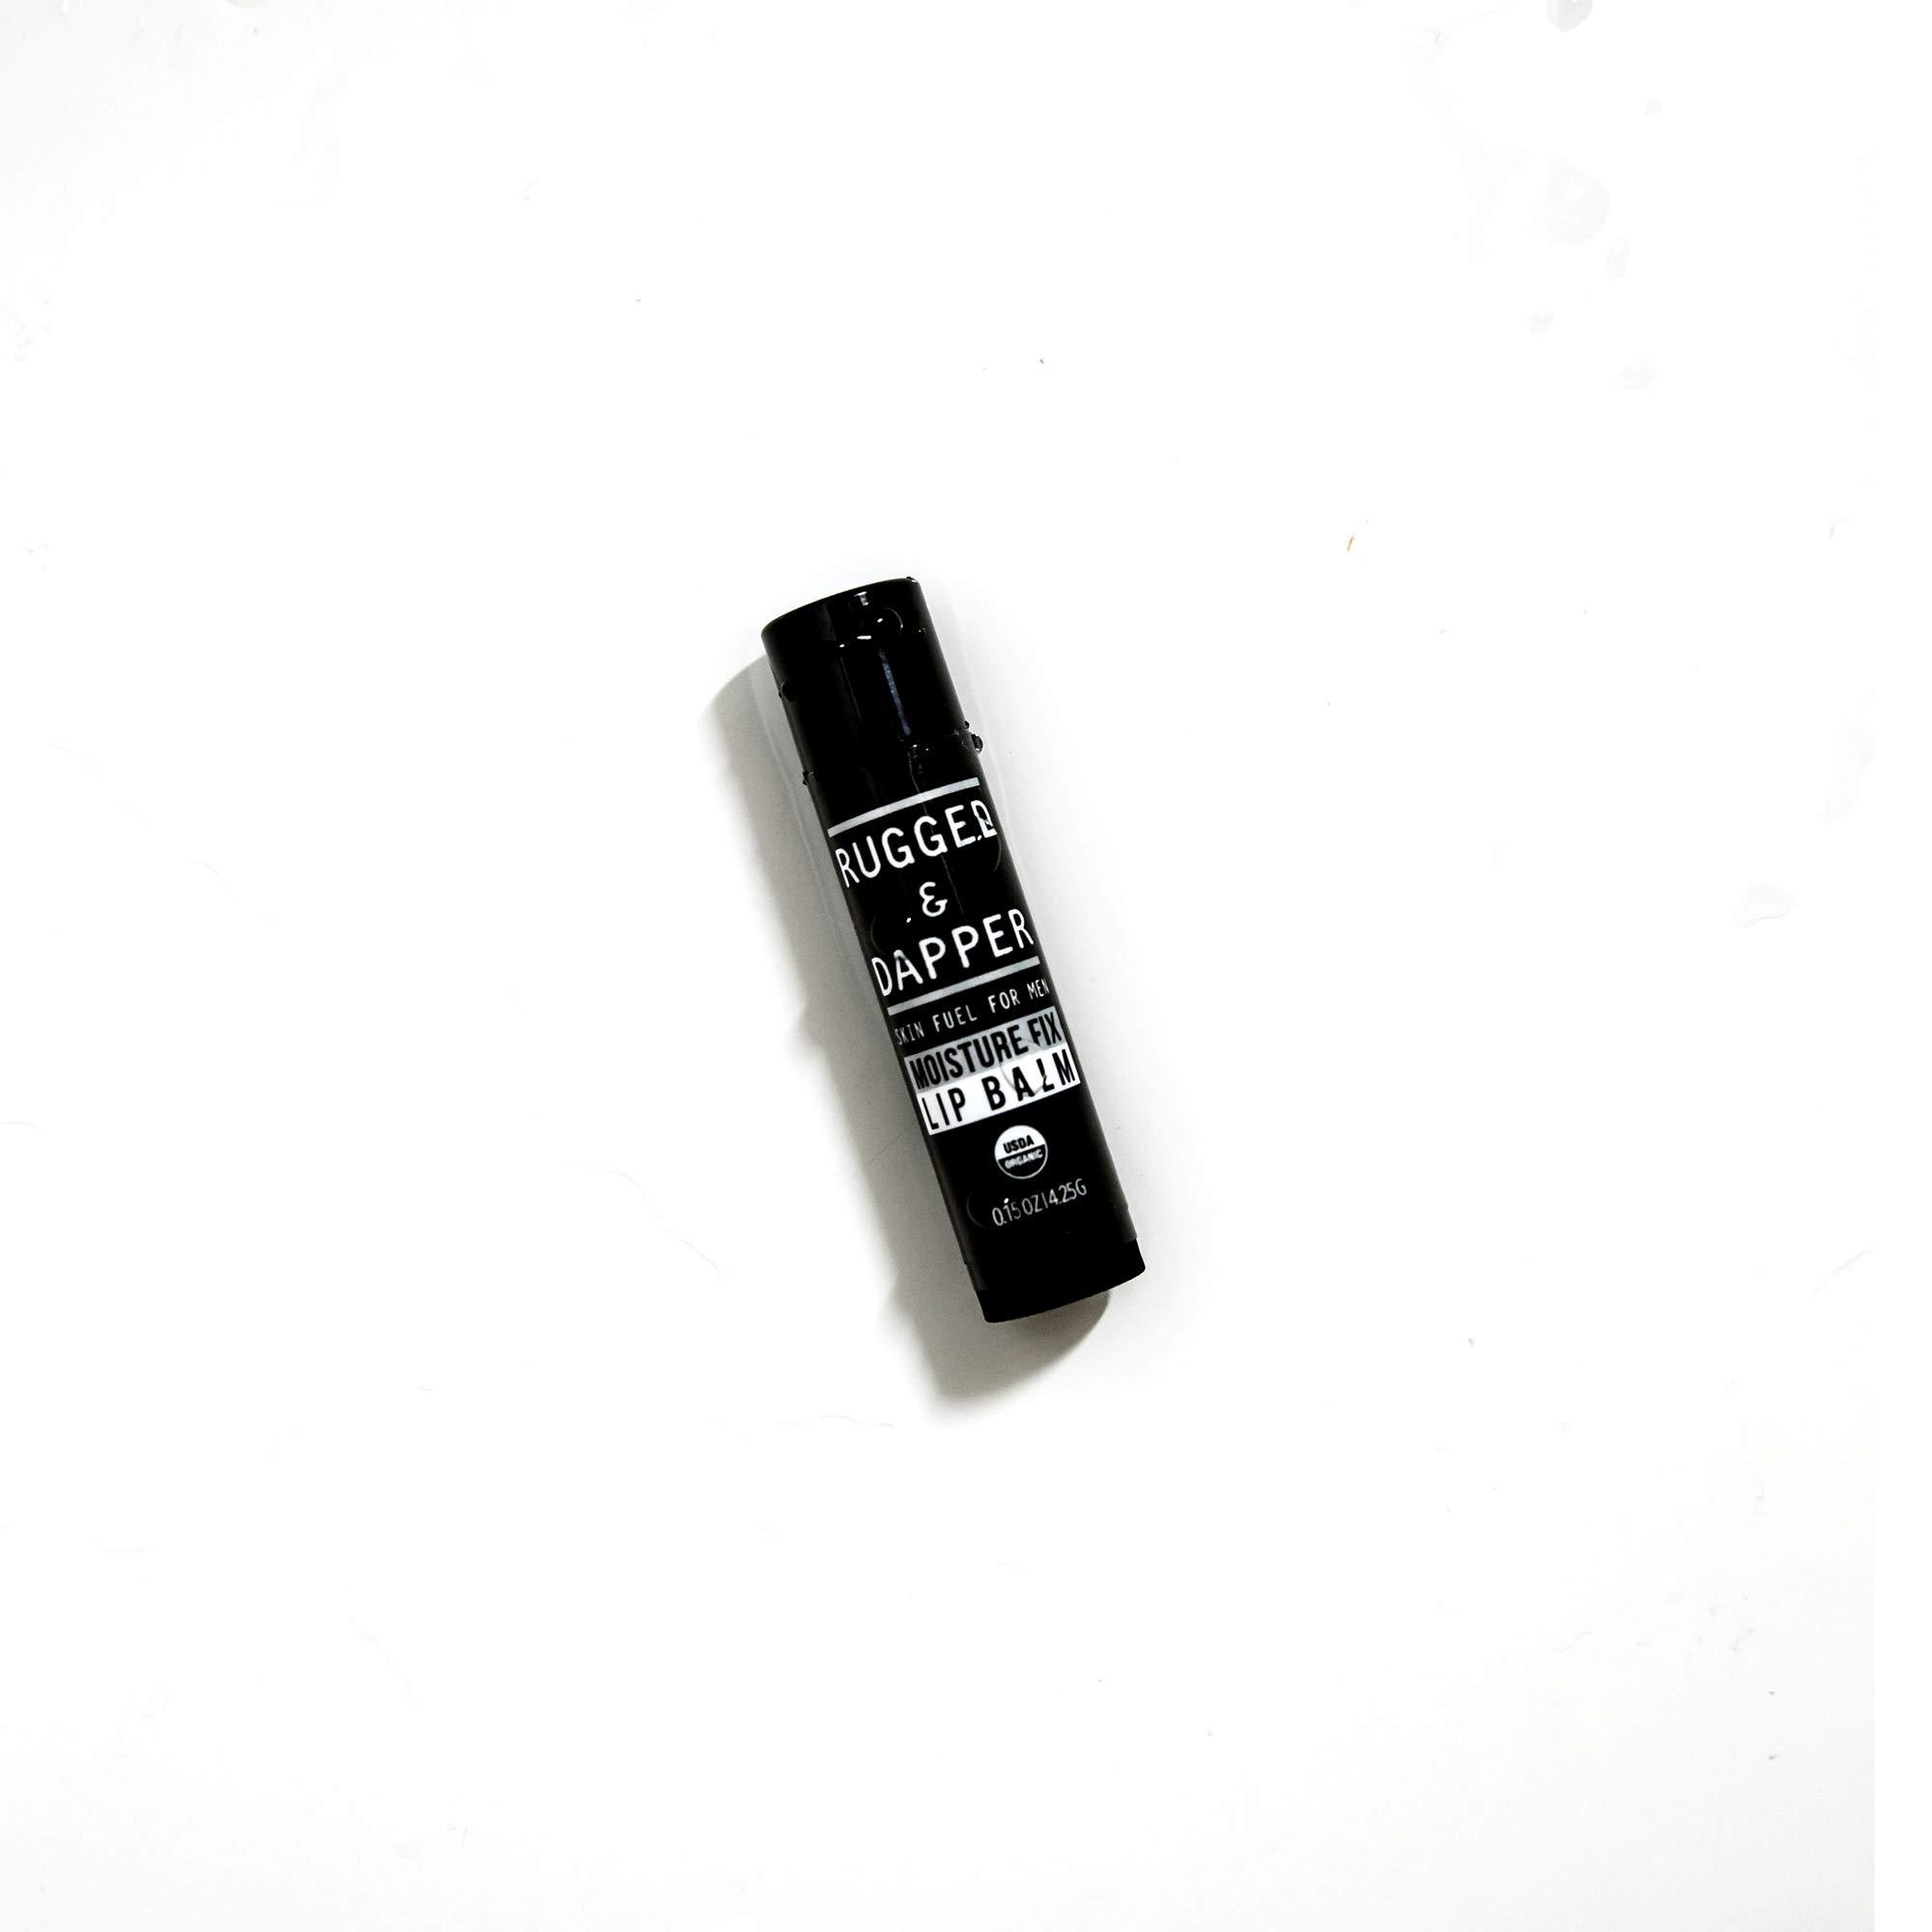 RUGGED & DAPPER Organic Lip Balm Set for Men, Eucalyptus and Mint, 4 Pack by RUGGED & DAPPER